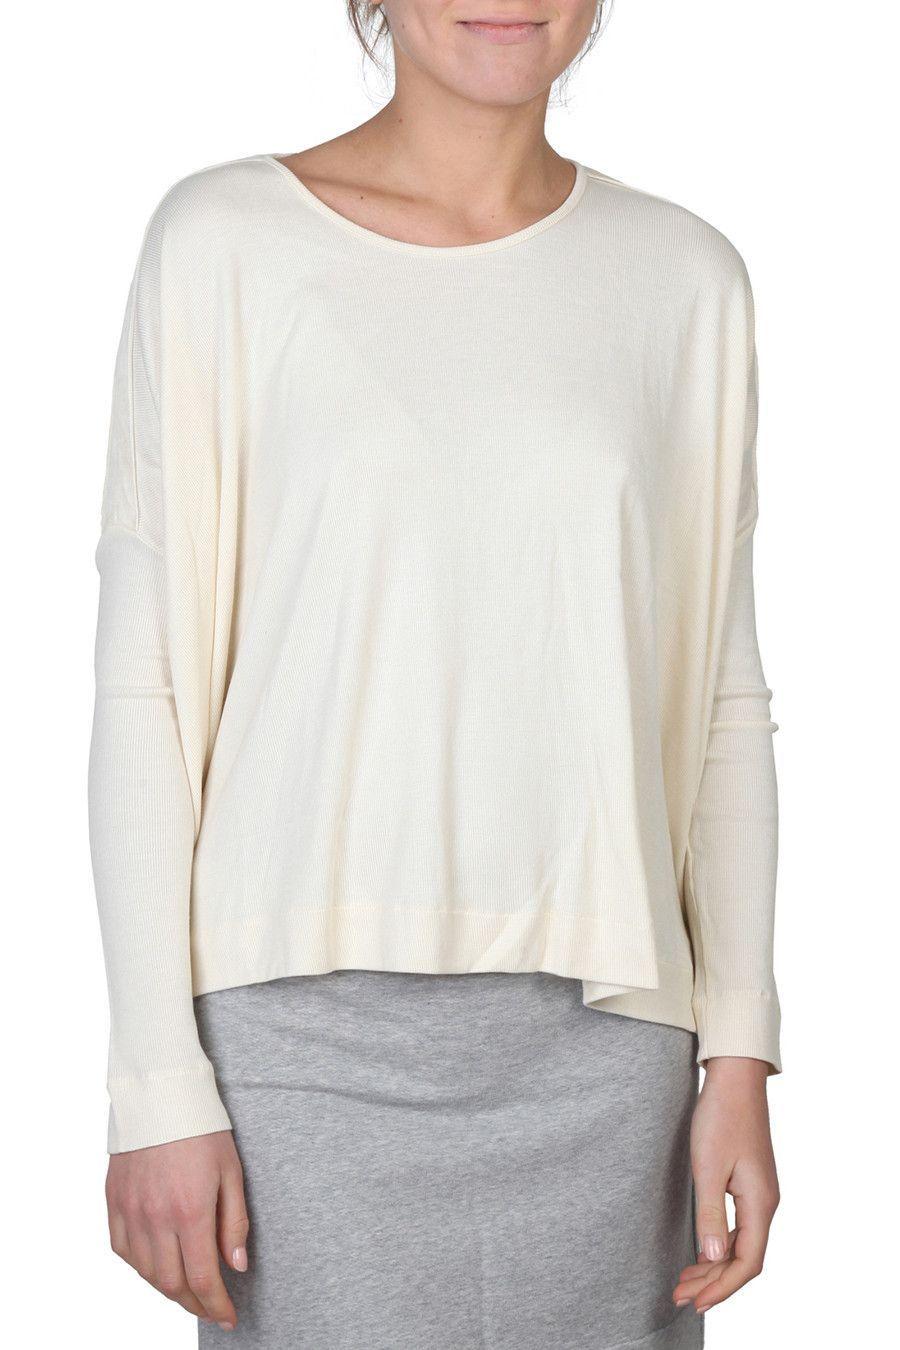 Chloe Maglia Sweatshirt In Cream